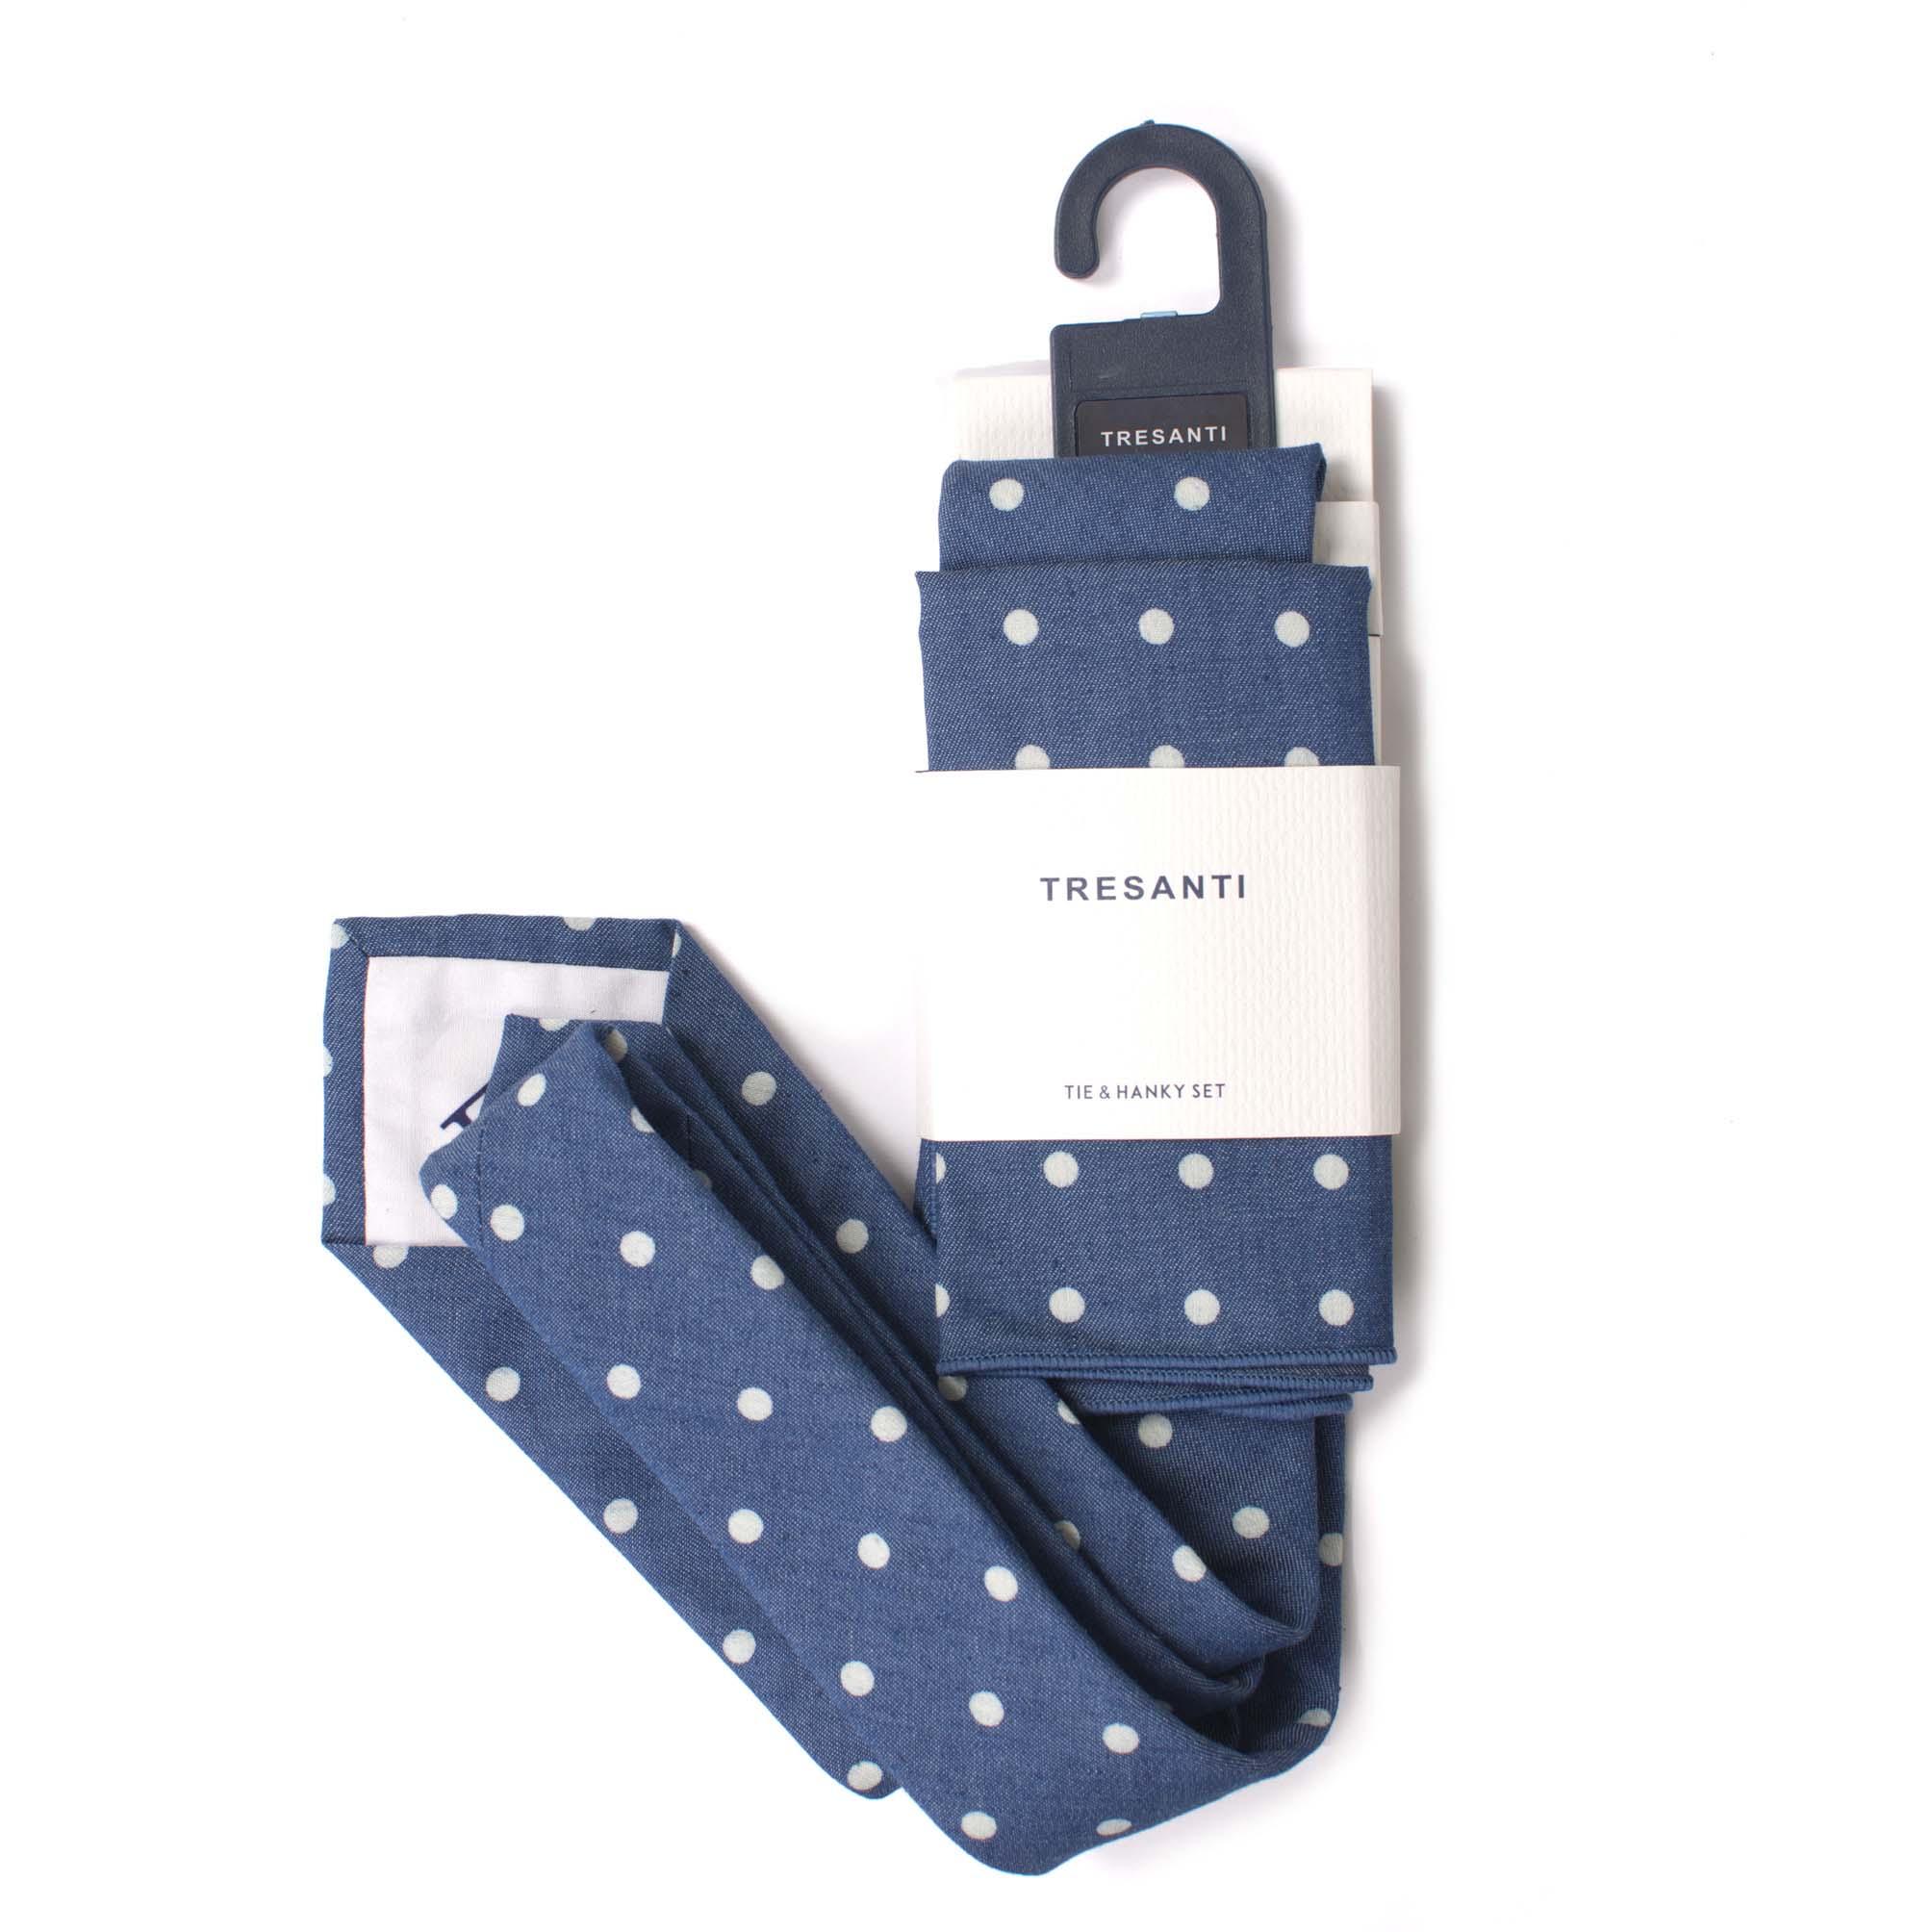 Tie & hanky set cotton dots